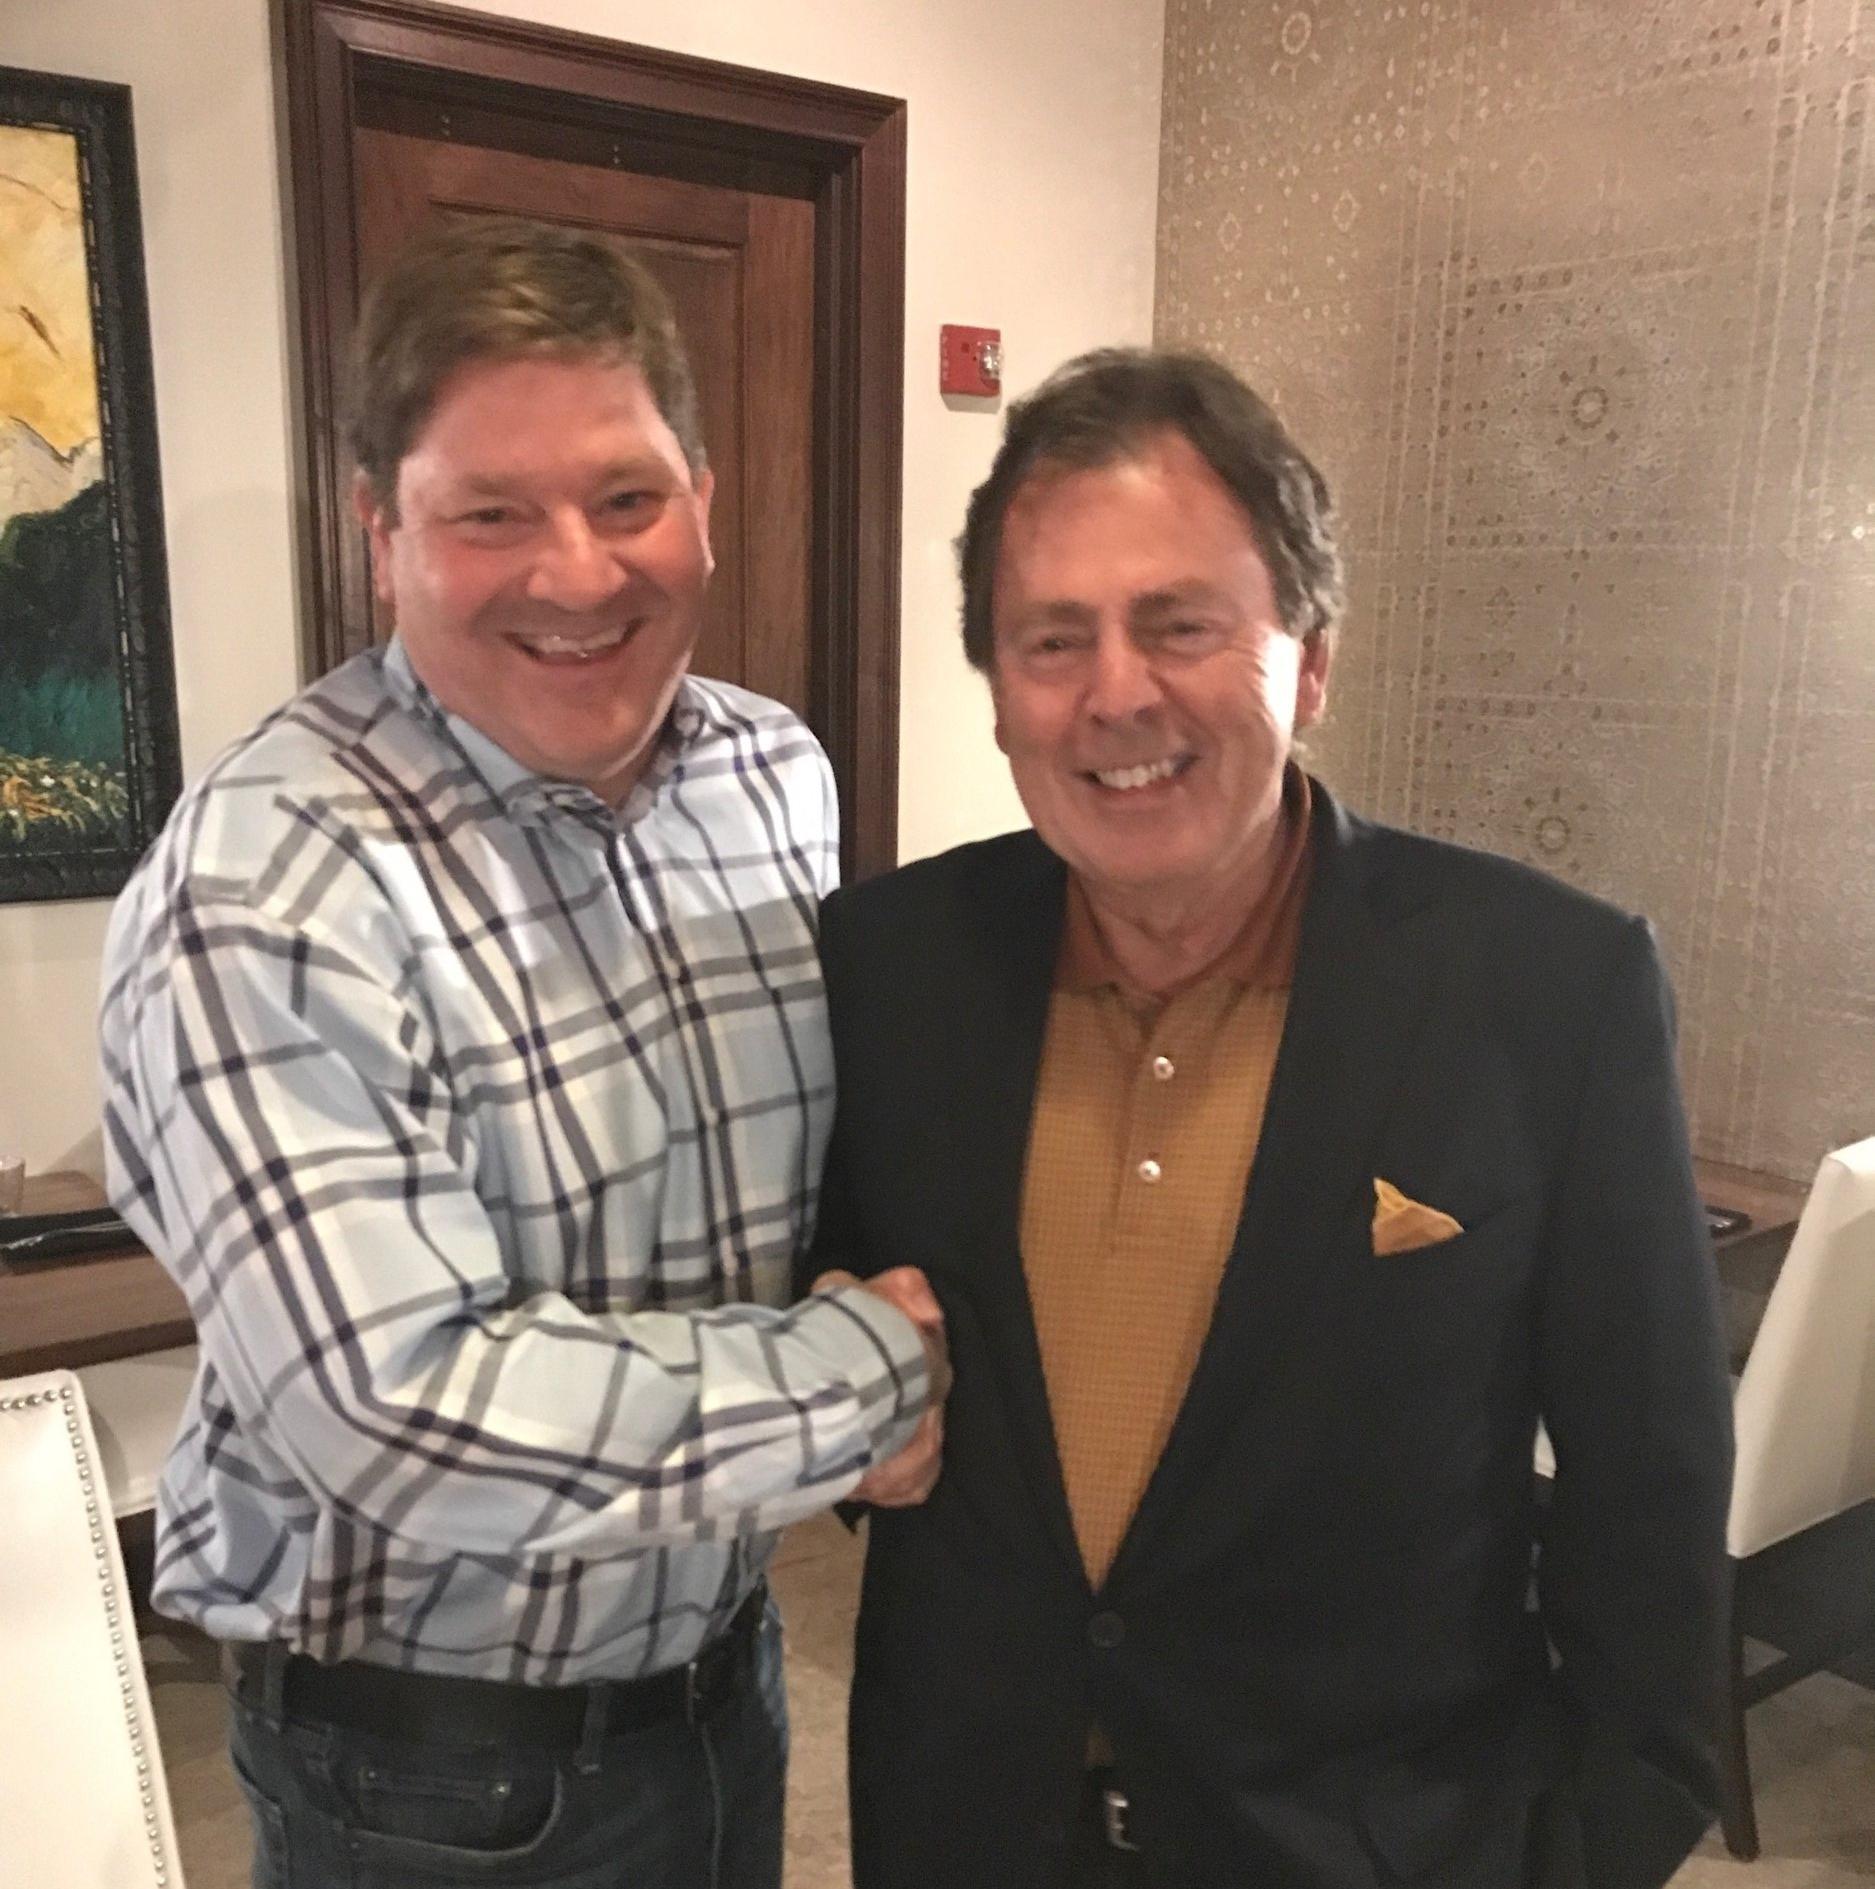 Richard C. Kessler CEO The Kessler Enterprise, Inc. and Dr. Charles Richardson